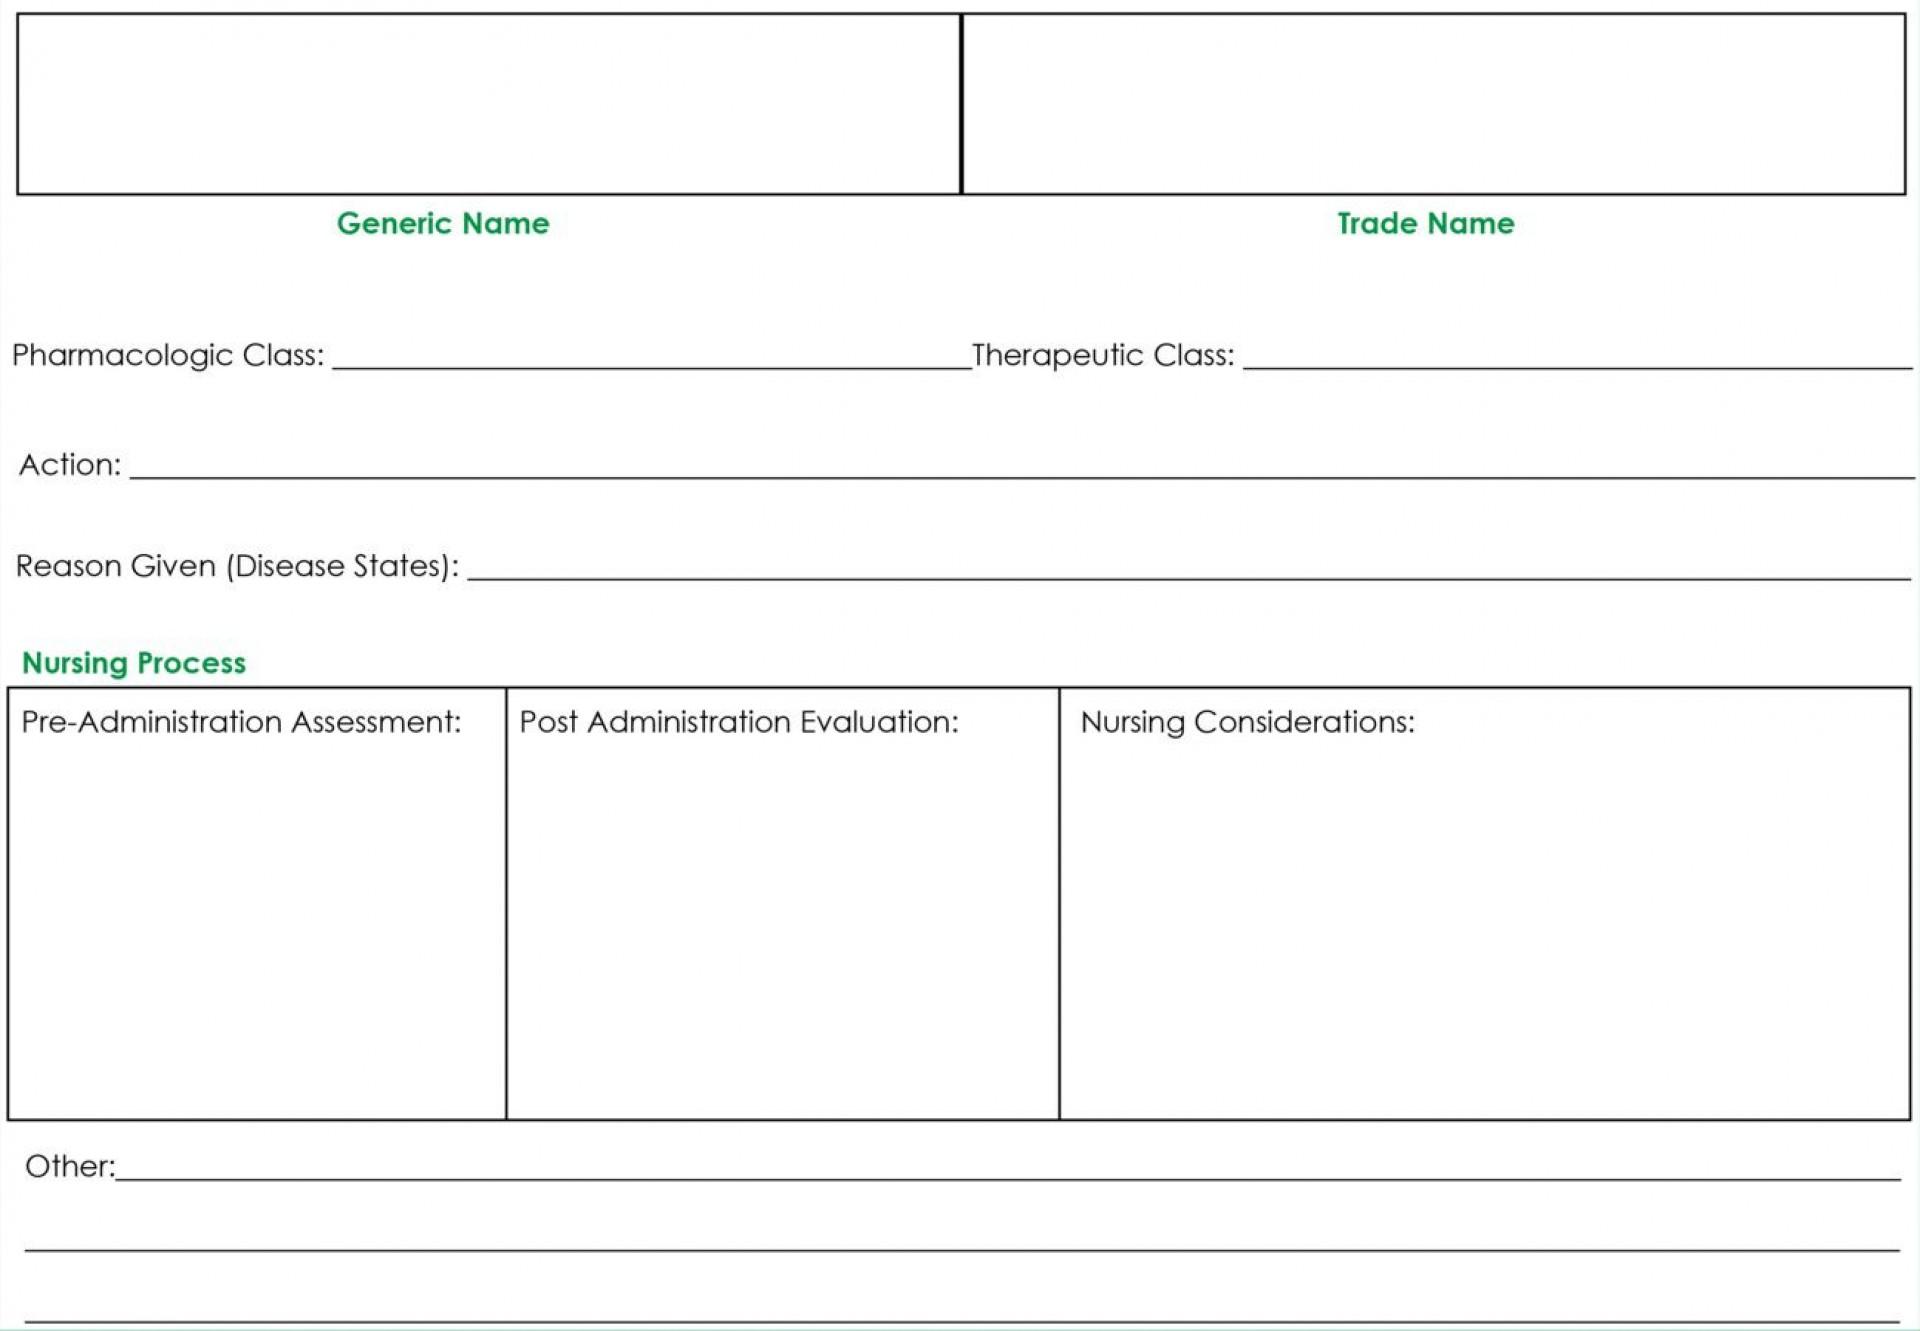 009 Wonderful Nursing Drug Card Template Concept  School Download Printable1920